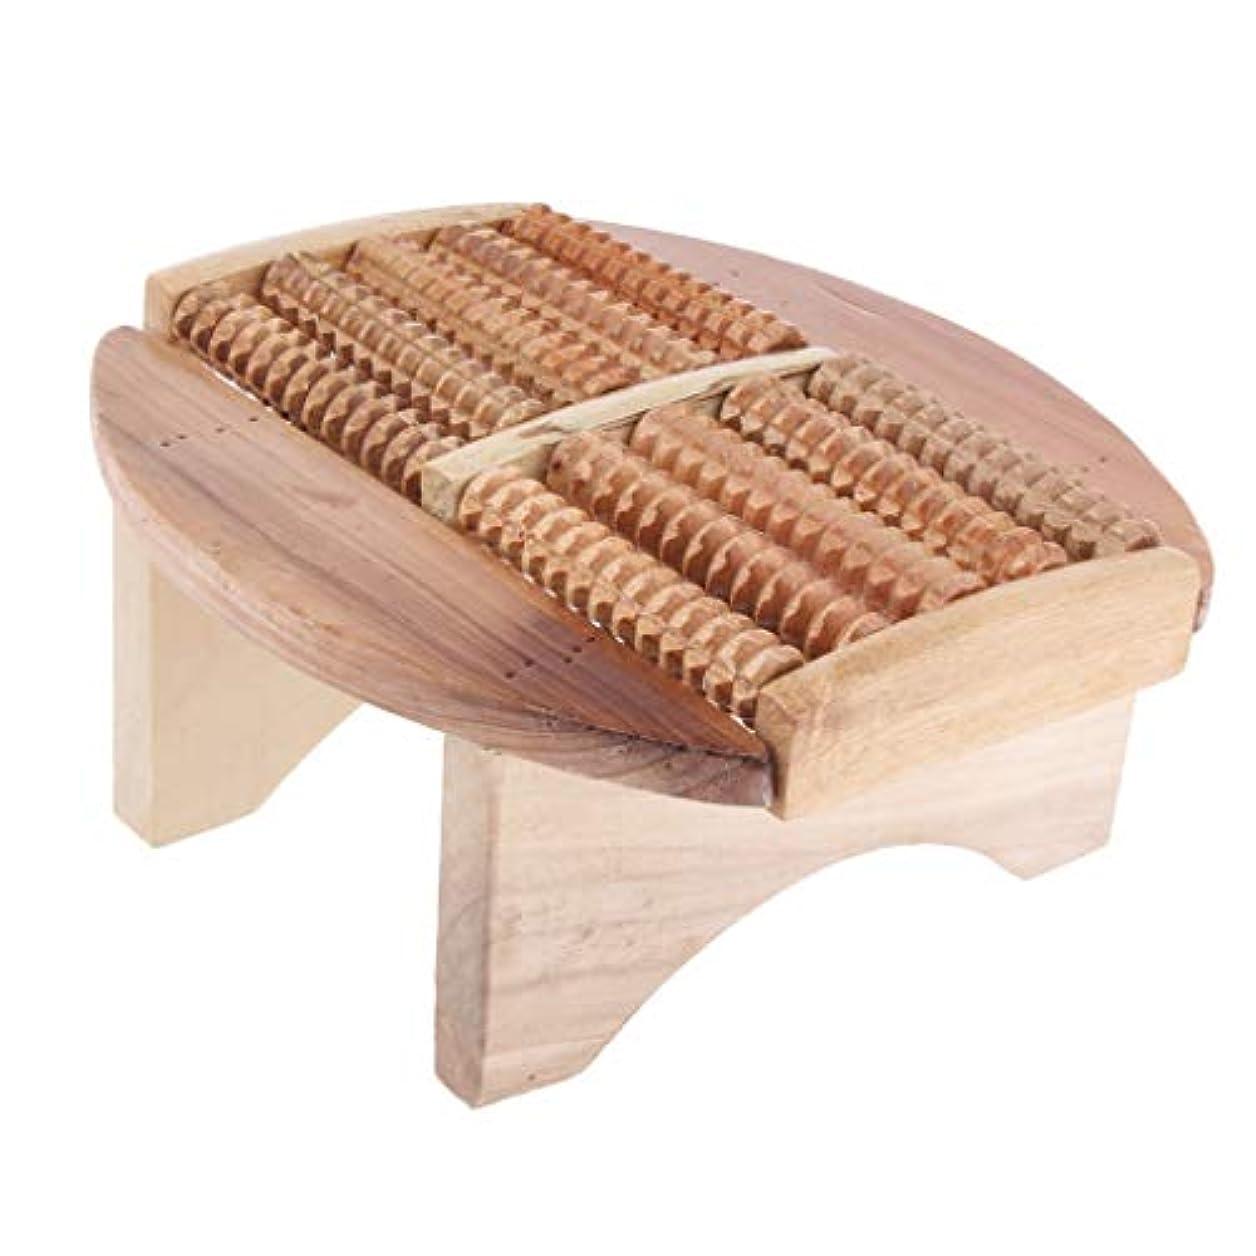 Baoblaze フットマッサージスツール 木製 足湯ステップ マッサージ スツール SPA